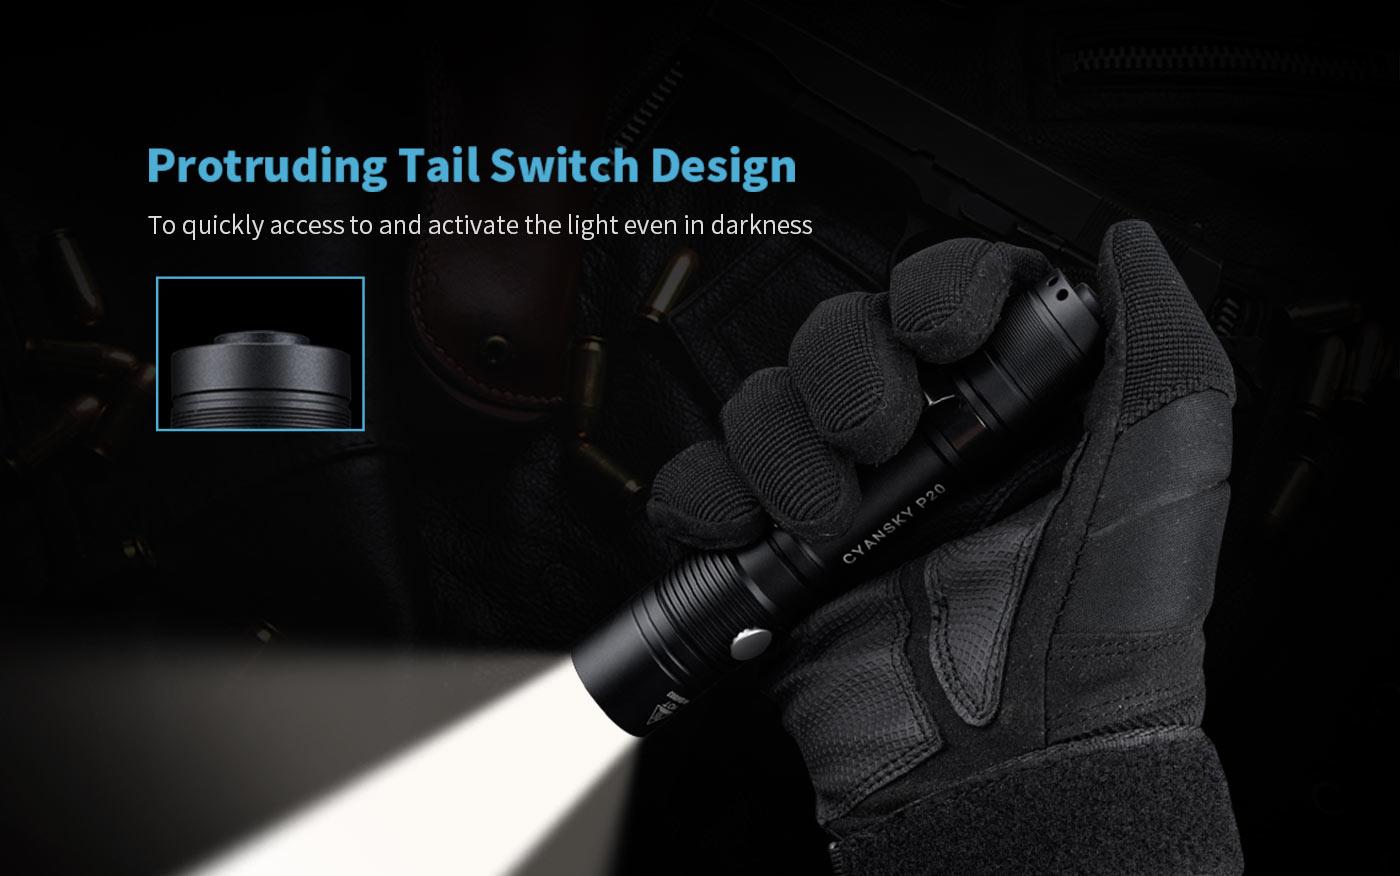 outdoor tactical flashlight, led flashlight outdoor, camping torch light